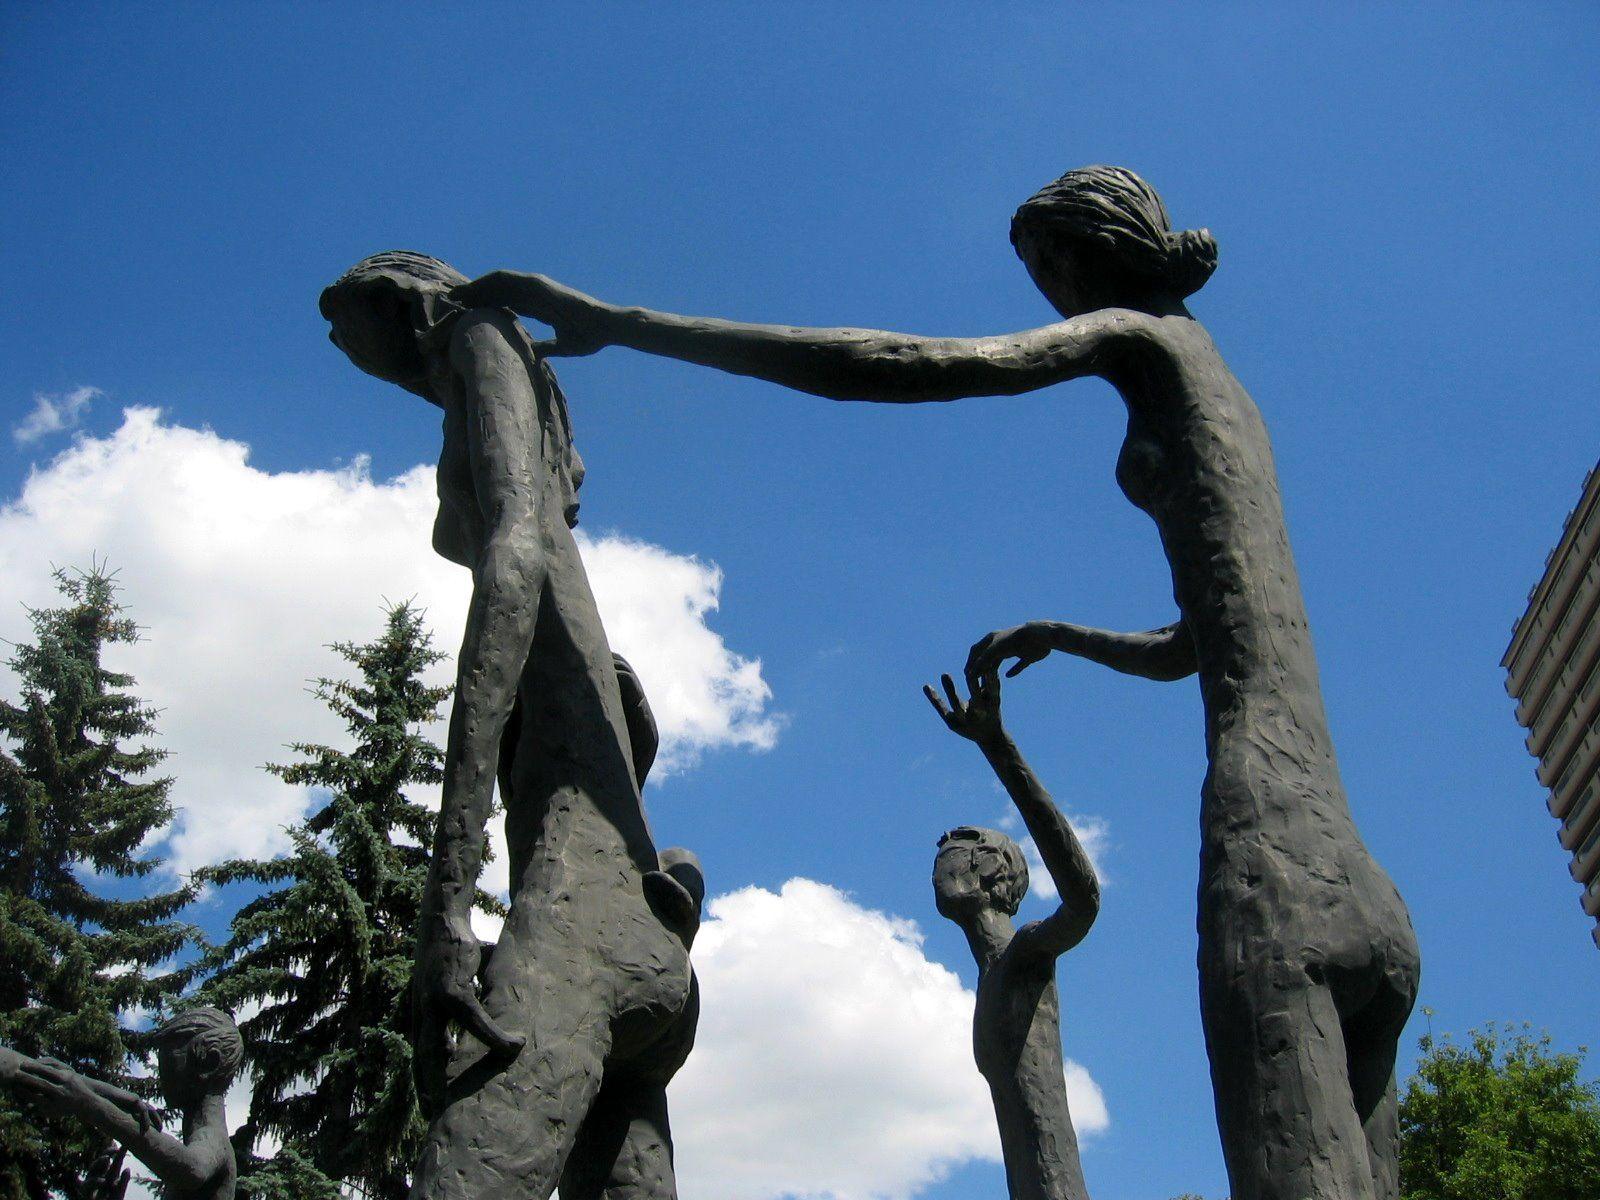 armature sculpture tutorial - Google Search | ARMATURES | Pinterest ...